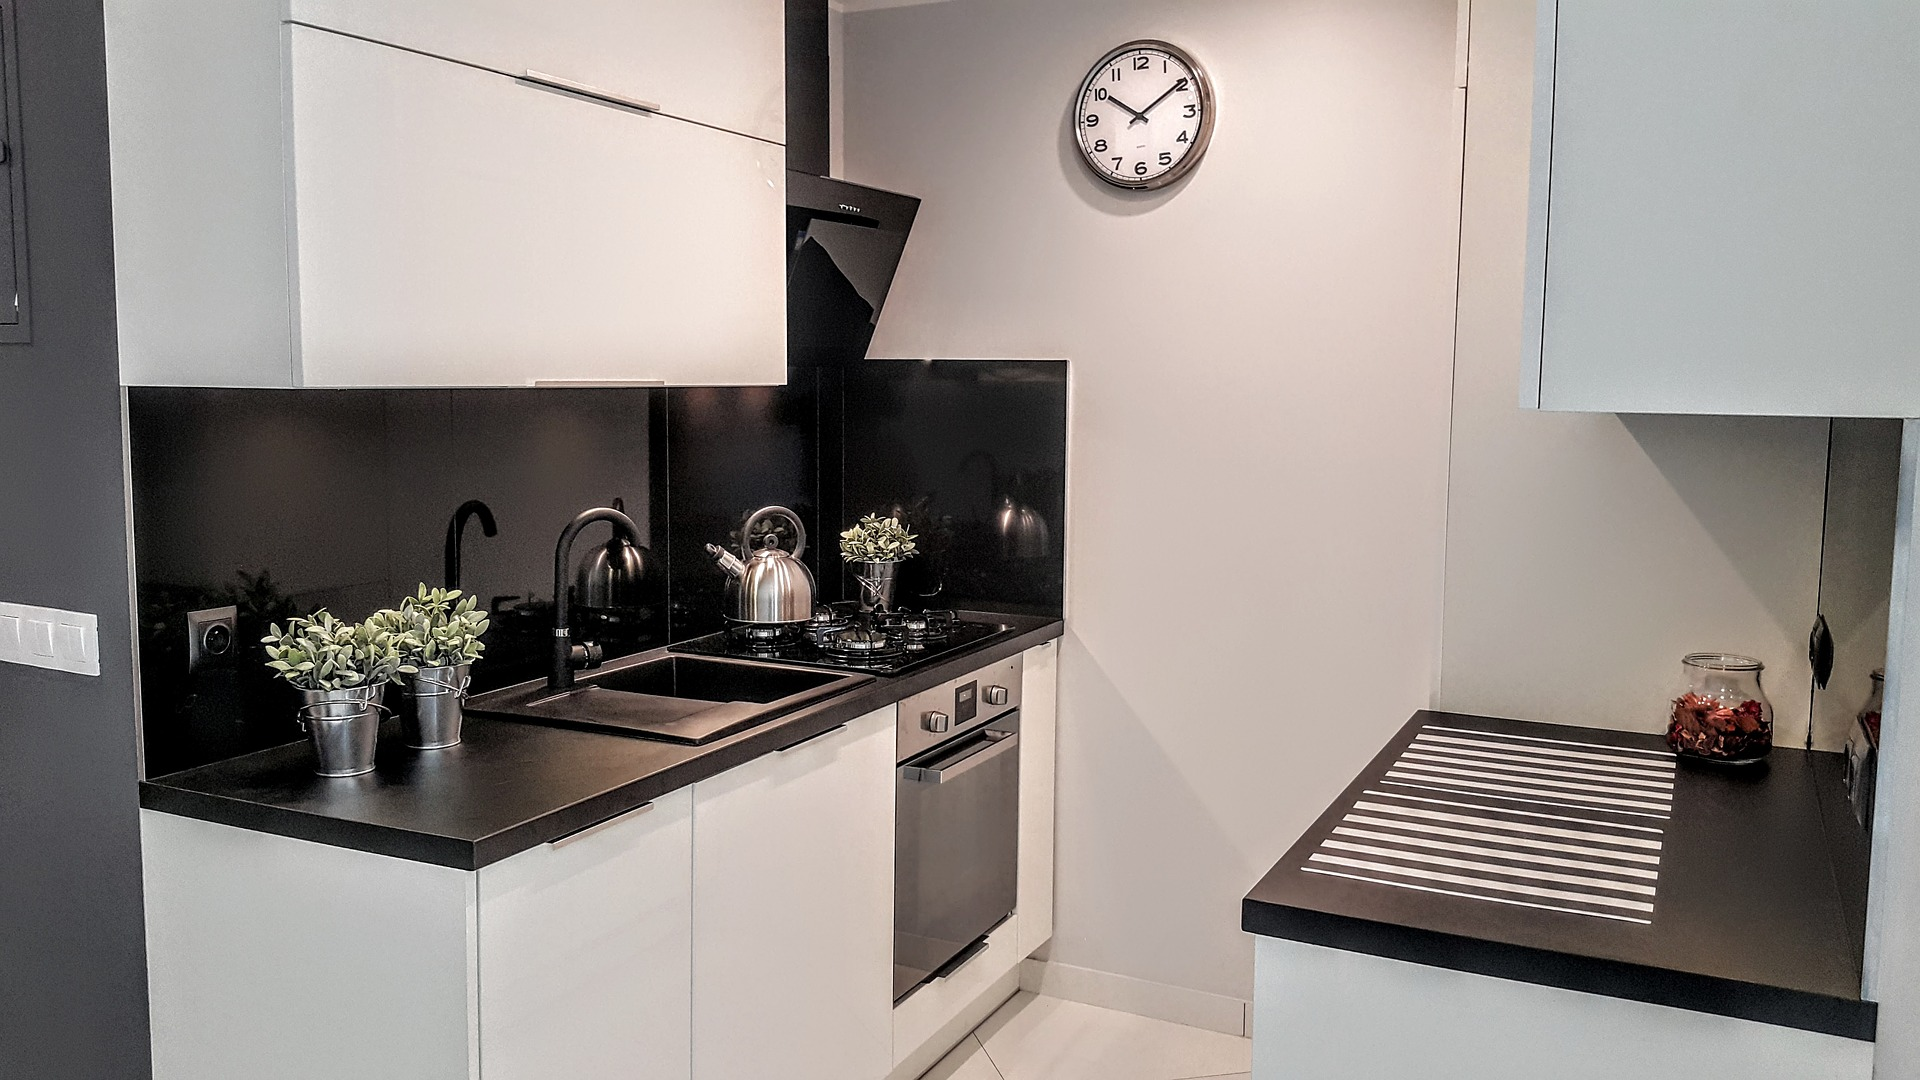 Bespoke Kitchens Sheffield Sidebar Image Hand Made Kitchens Sheffield And Hand Made Furniture